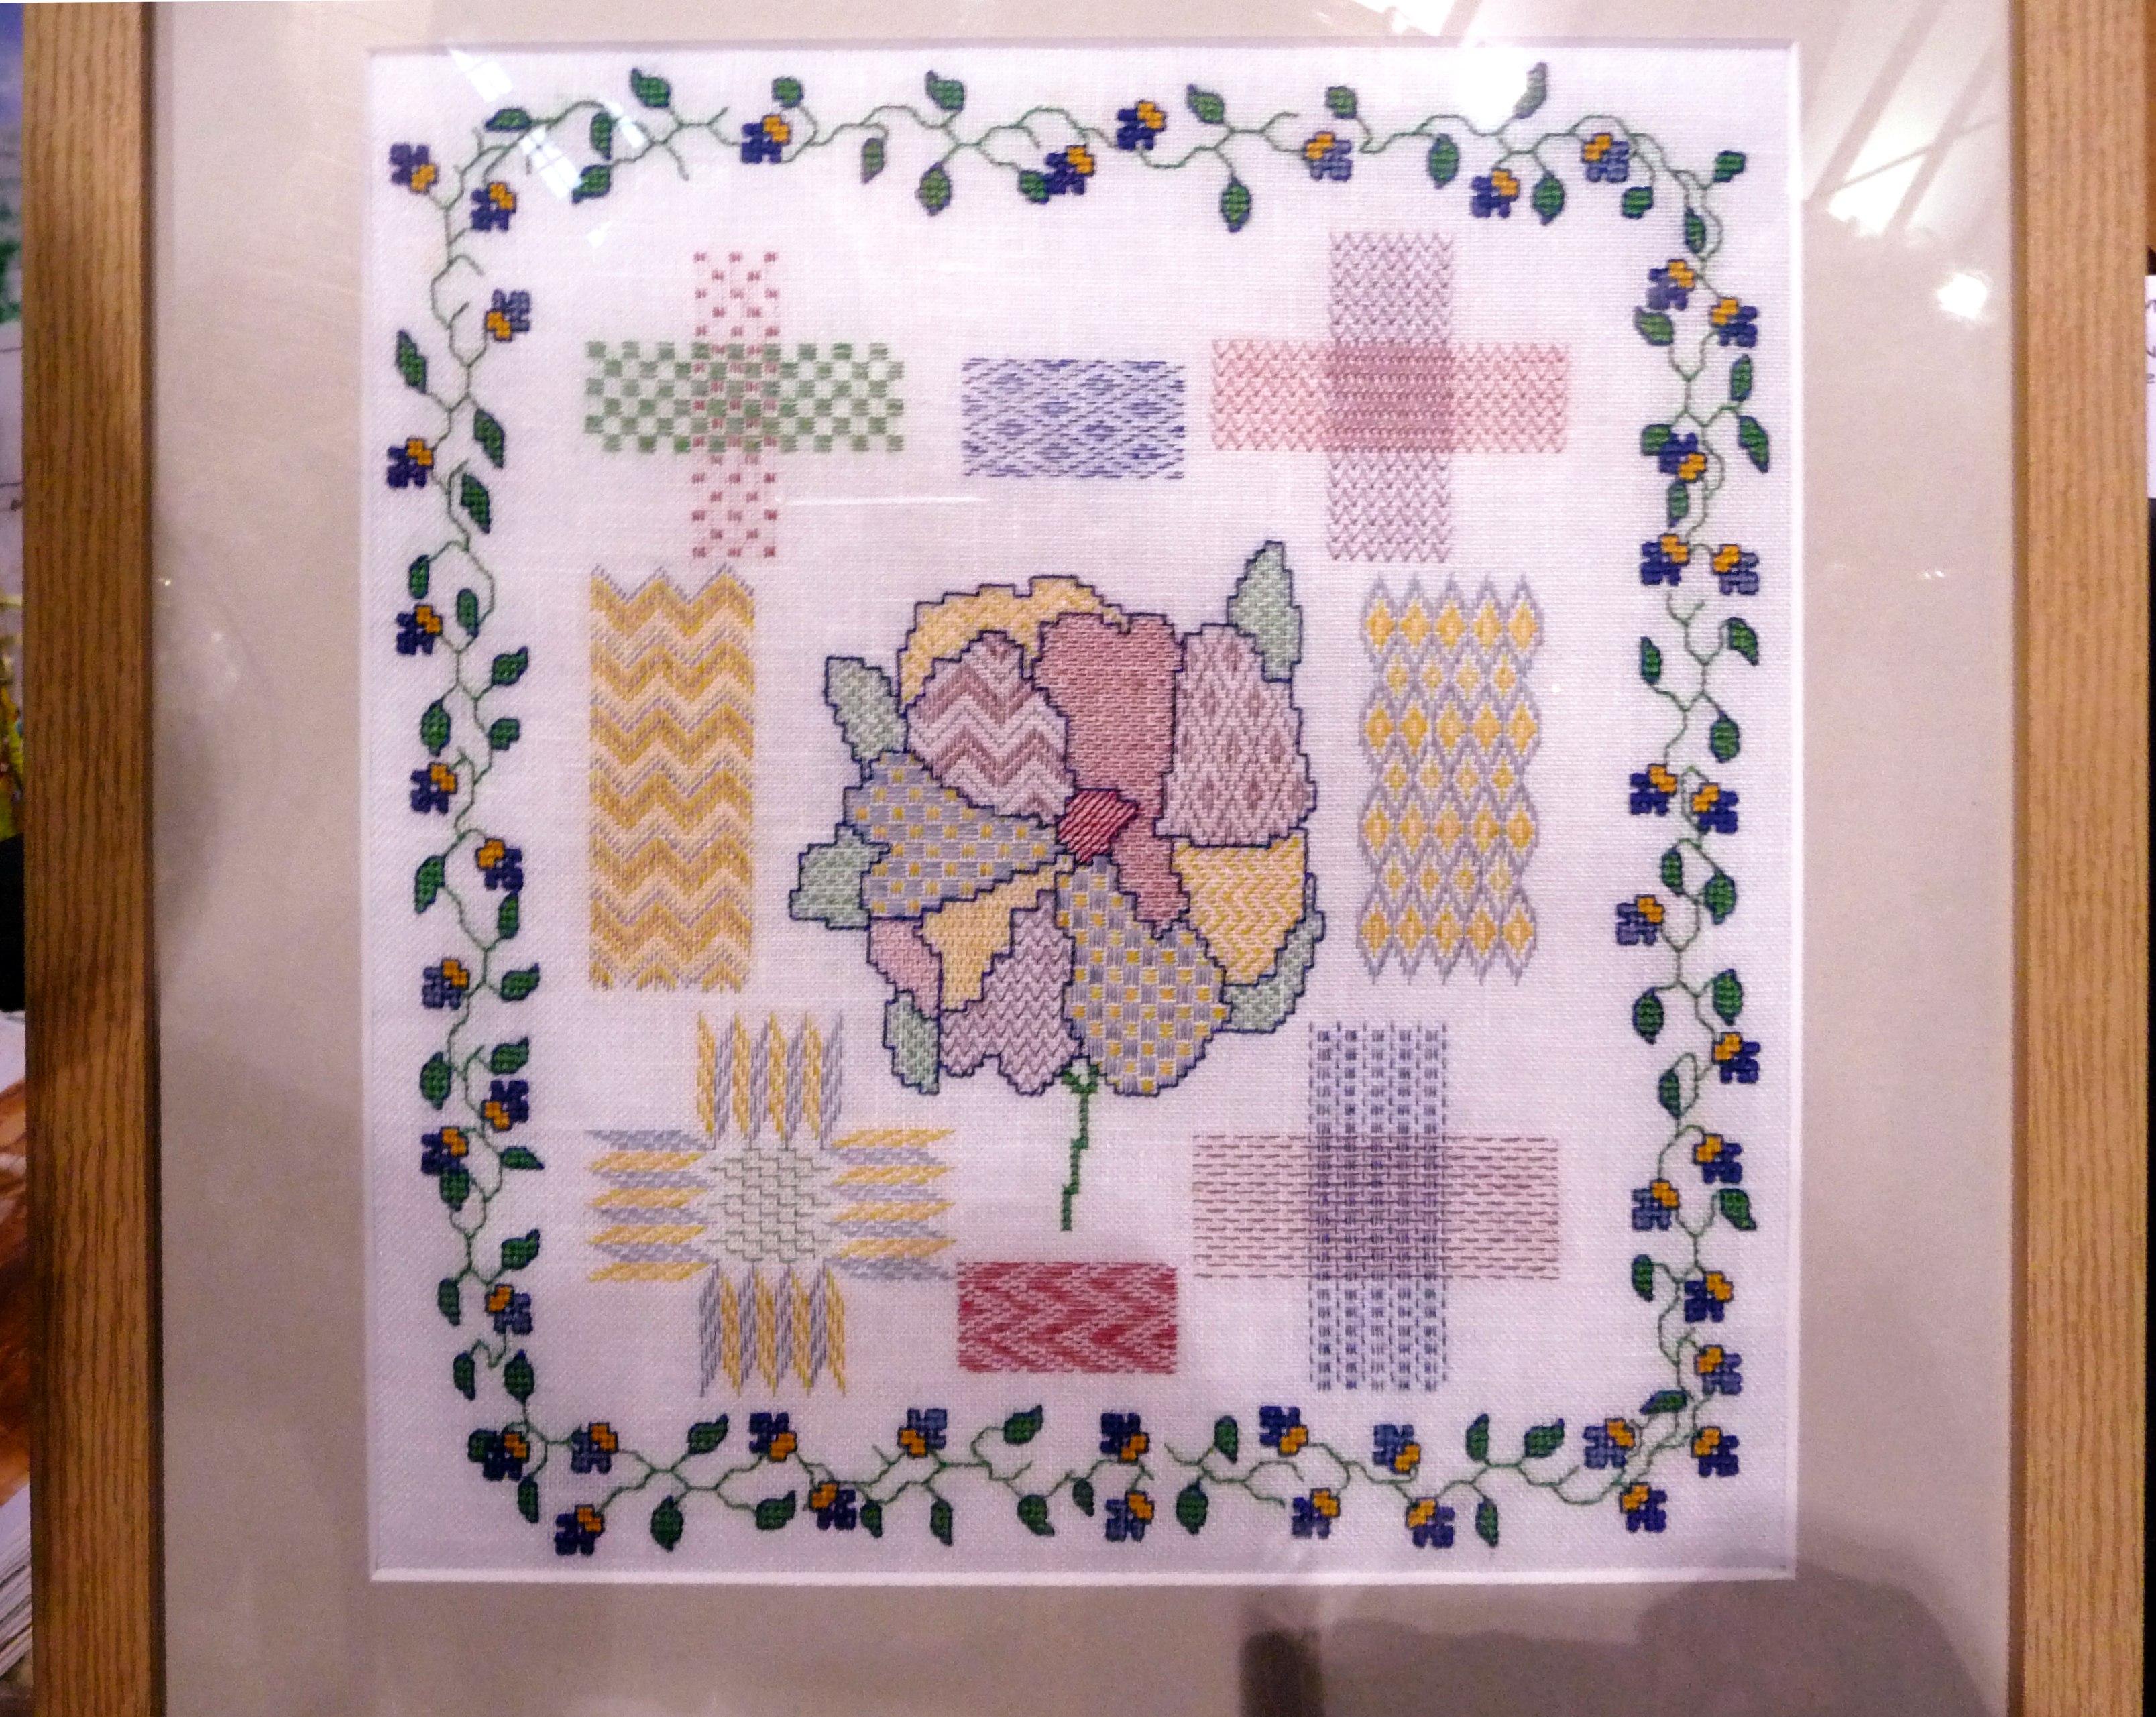 GARDENIA -DARNING SAMPLER by Gill McKenna, hand embroidery on linen